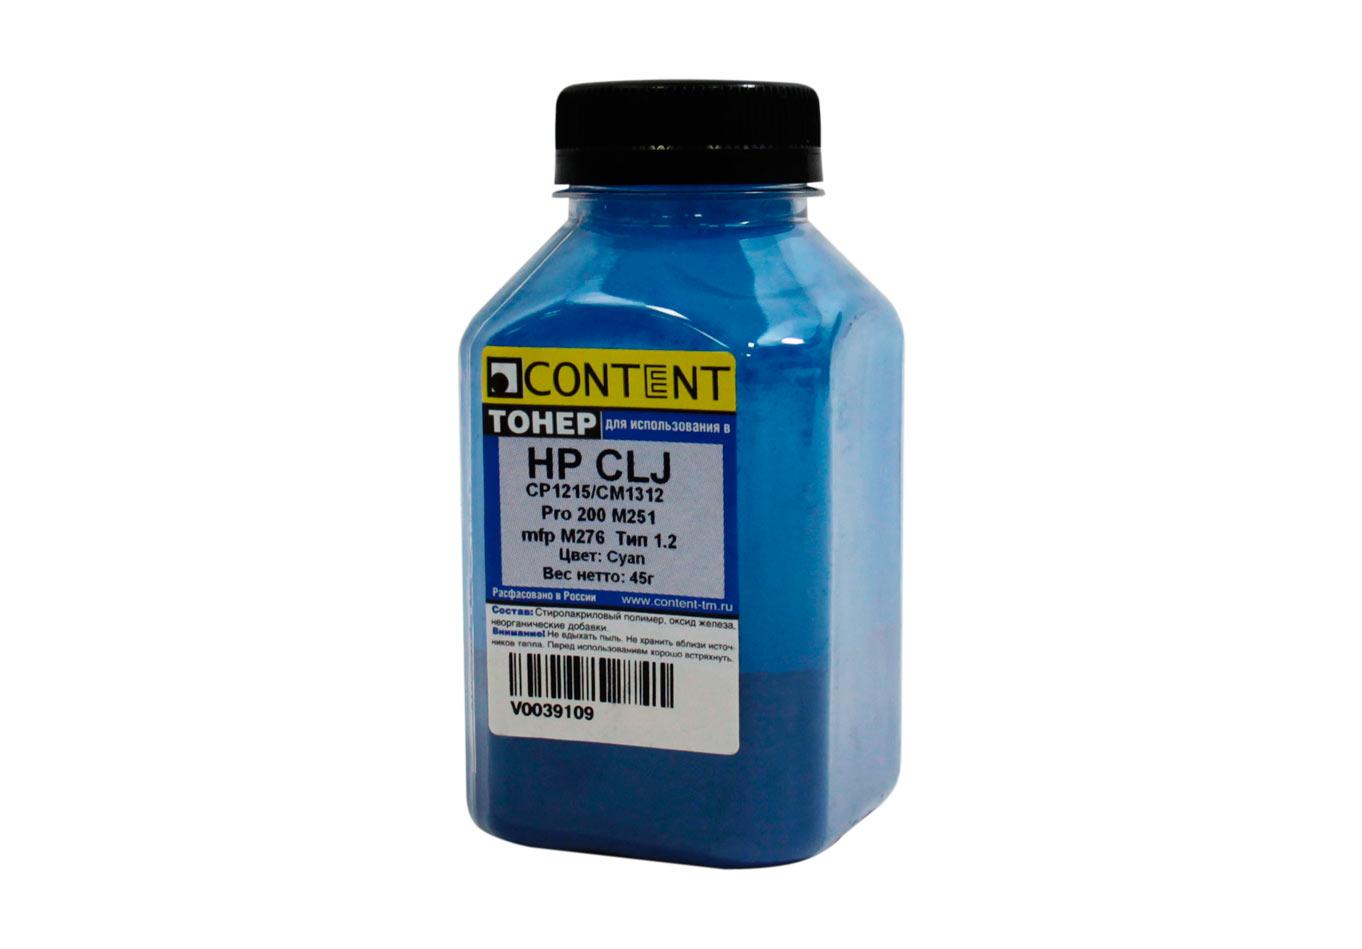 Тонер Content для HP CLJ CP1215/CM1312/Pro 200 M251/mfp M276, Тип 1.2, C, 45 г, банка